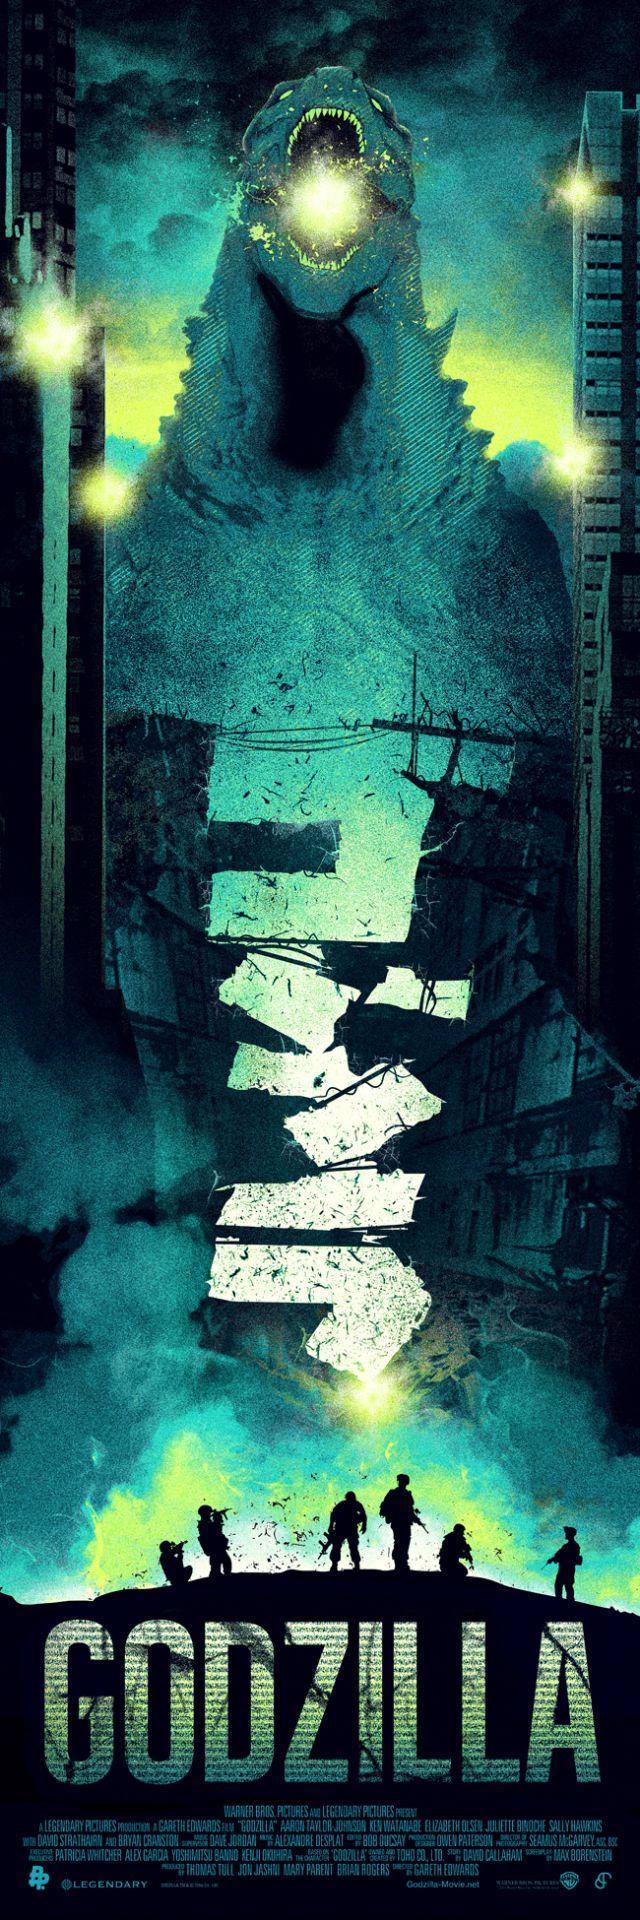 Godzilla by Patrick Connan